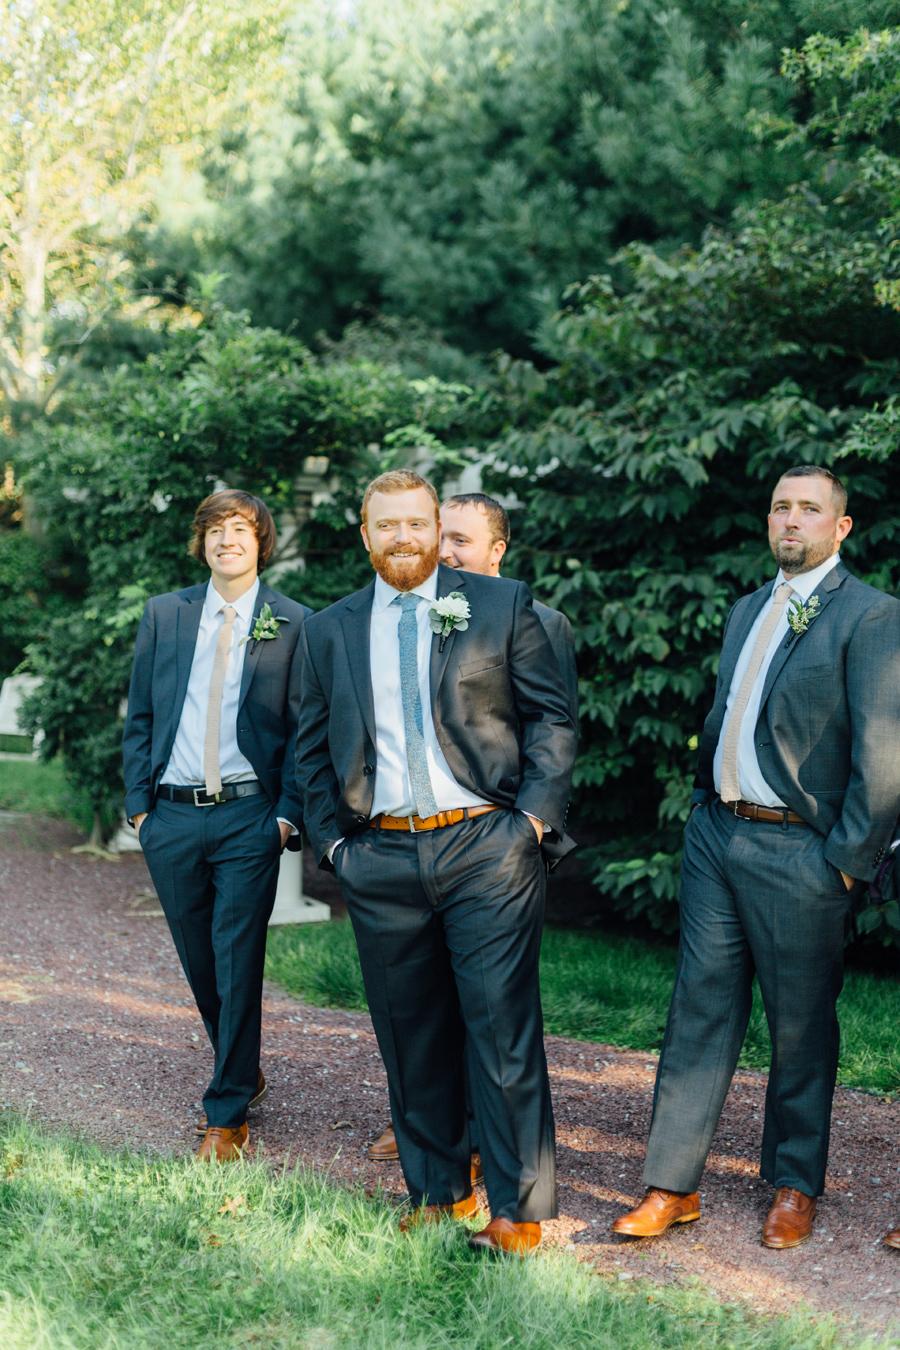 the-inn-at-leola-wedding-lancaster-pennsylvania-wedding-photographer-rebeka-viola-photograhy (45).jpg